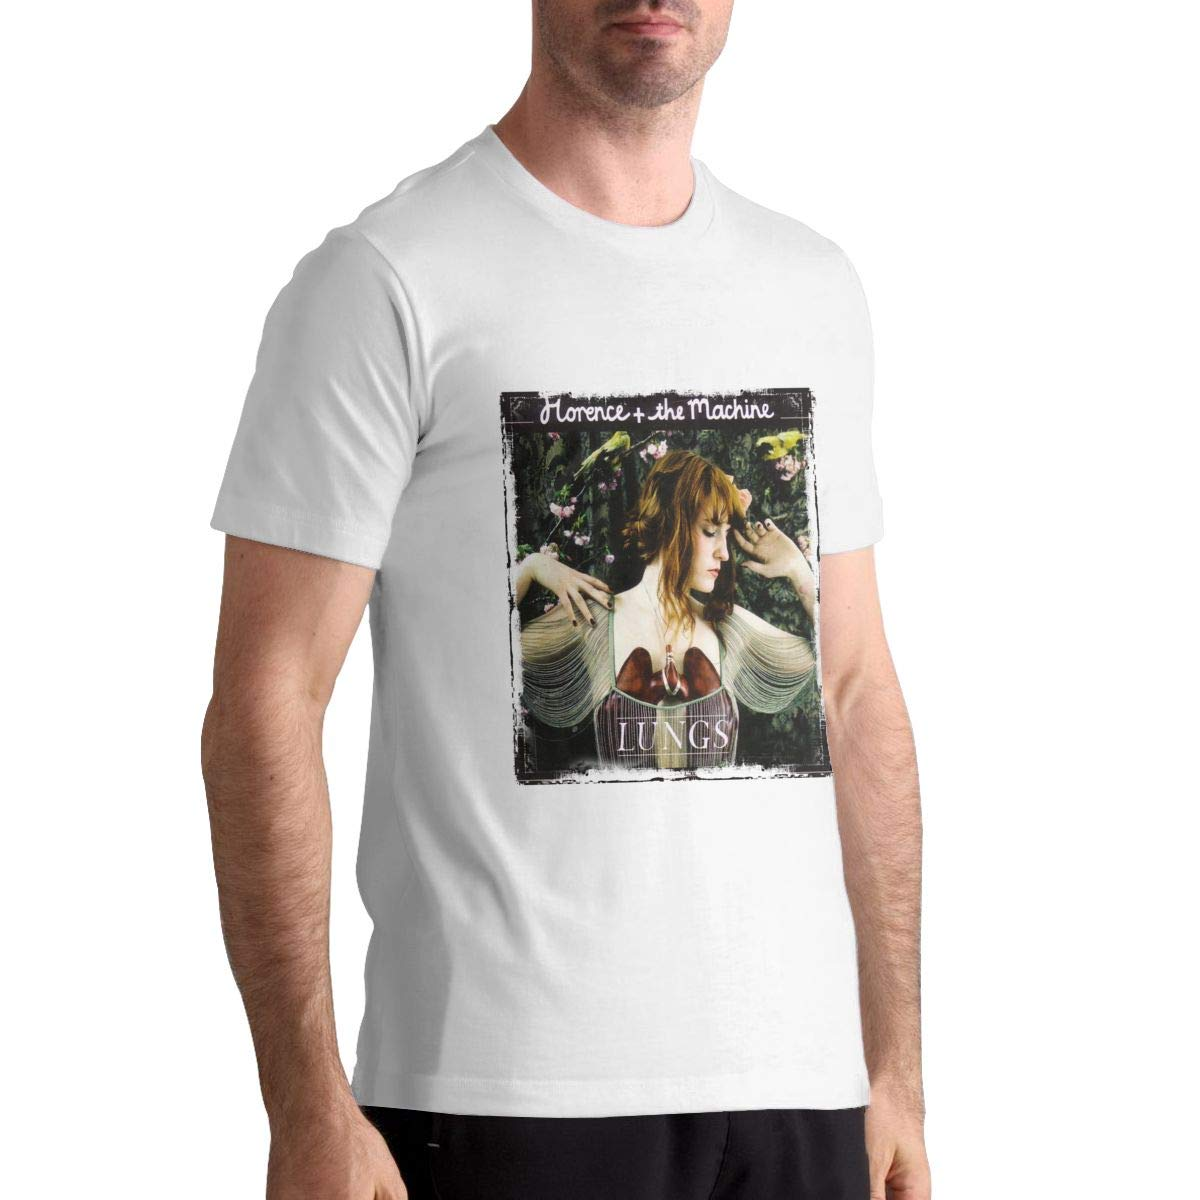 DANIEL BURTON Soft Fit Florence and The Machine Mens Black Shirts Top Tees Short Sleeve Shirts